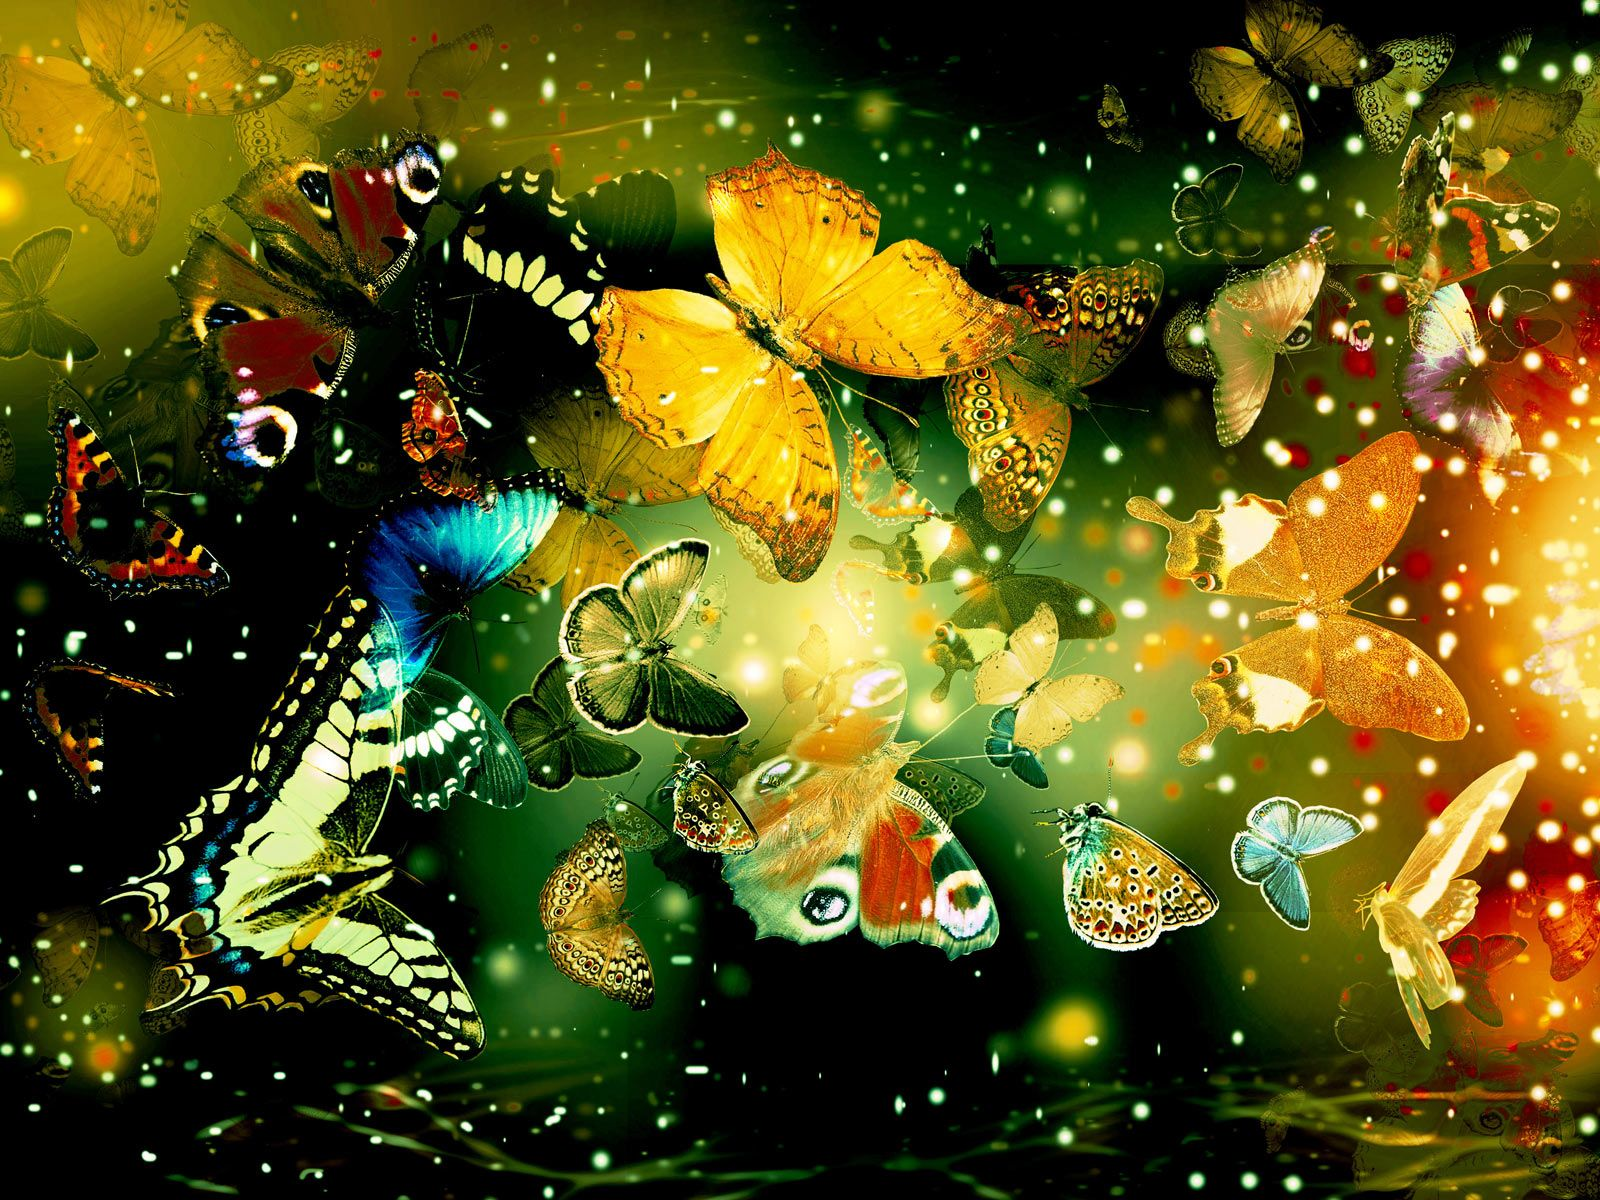 free butterflies wallpaper and other animal desktop backgrounds get free computer wallpapers of butterflies